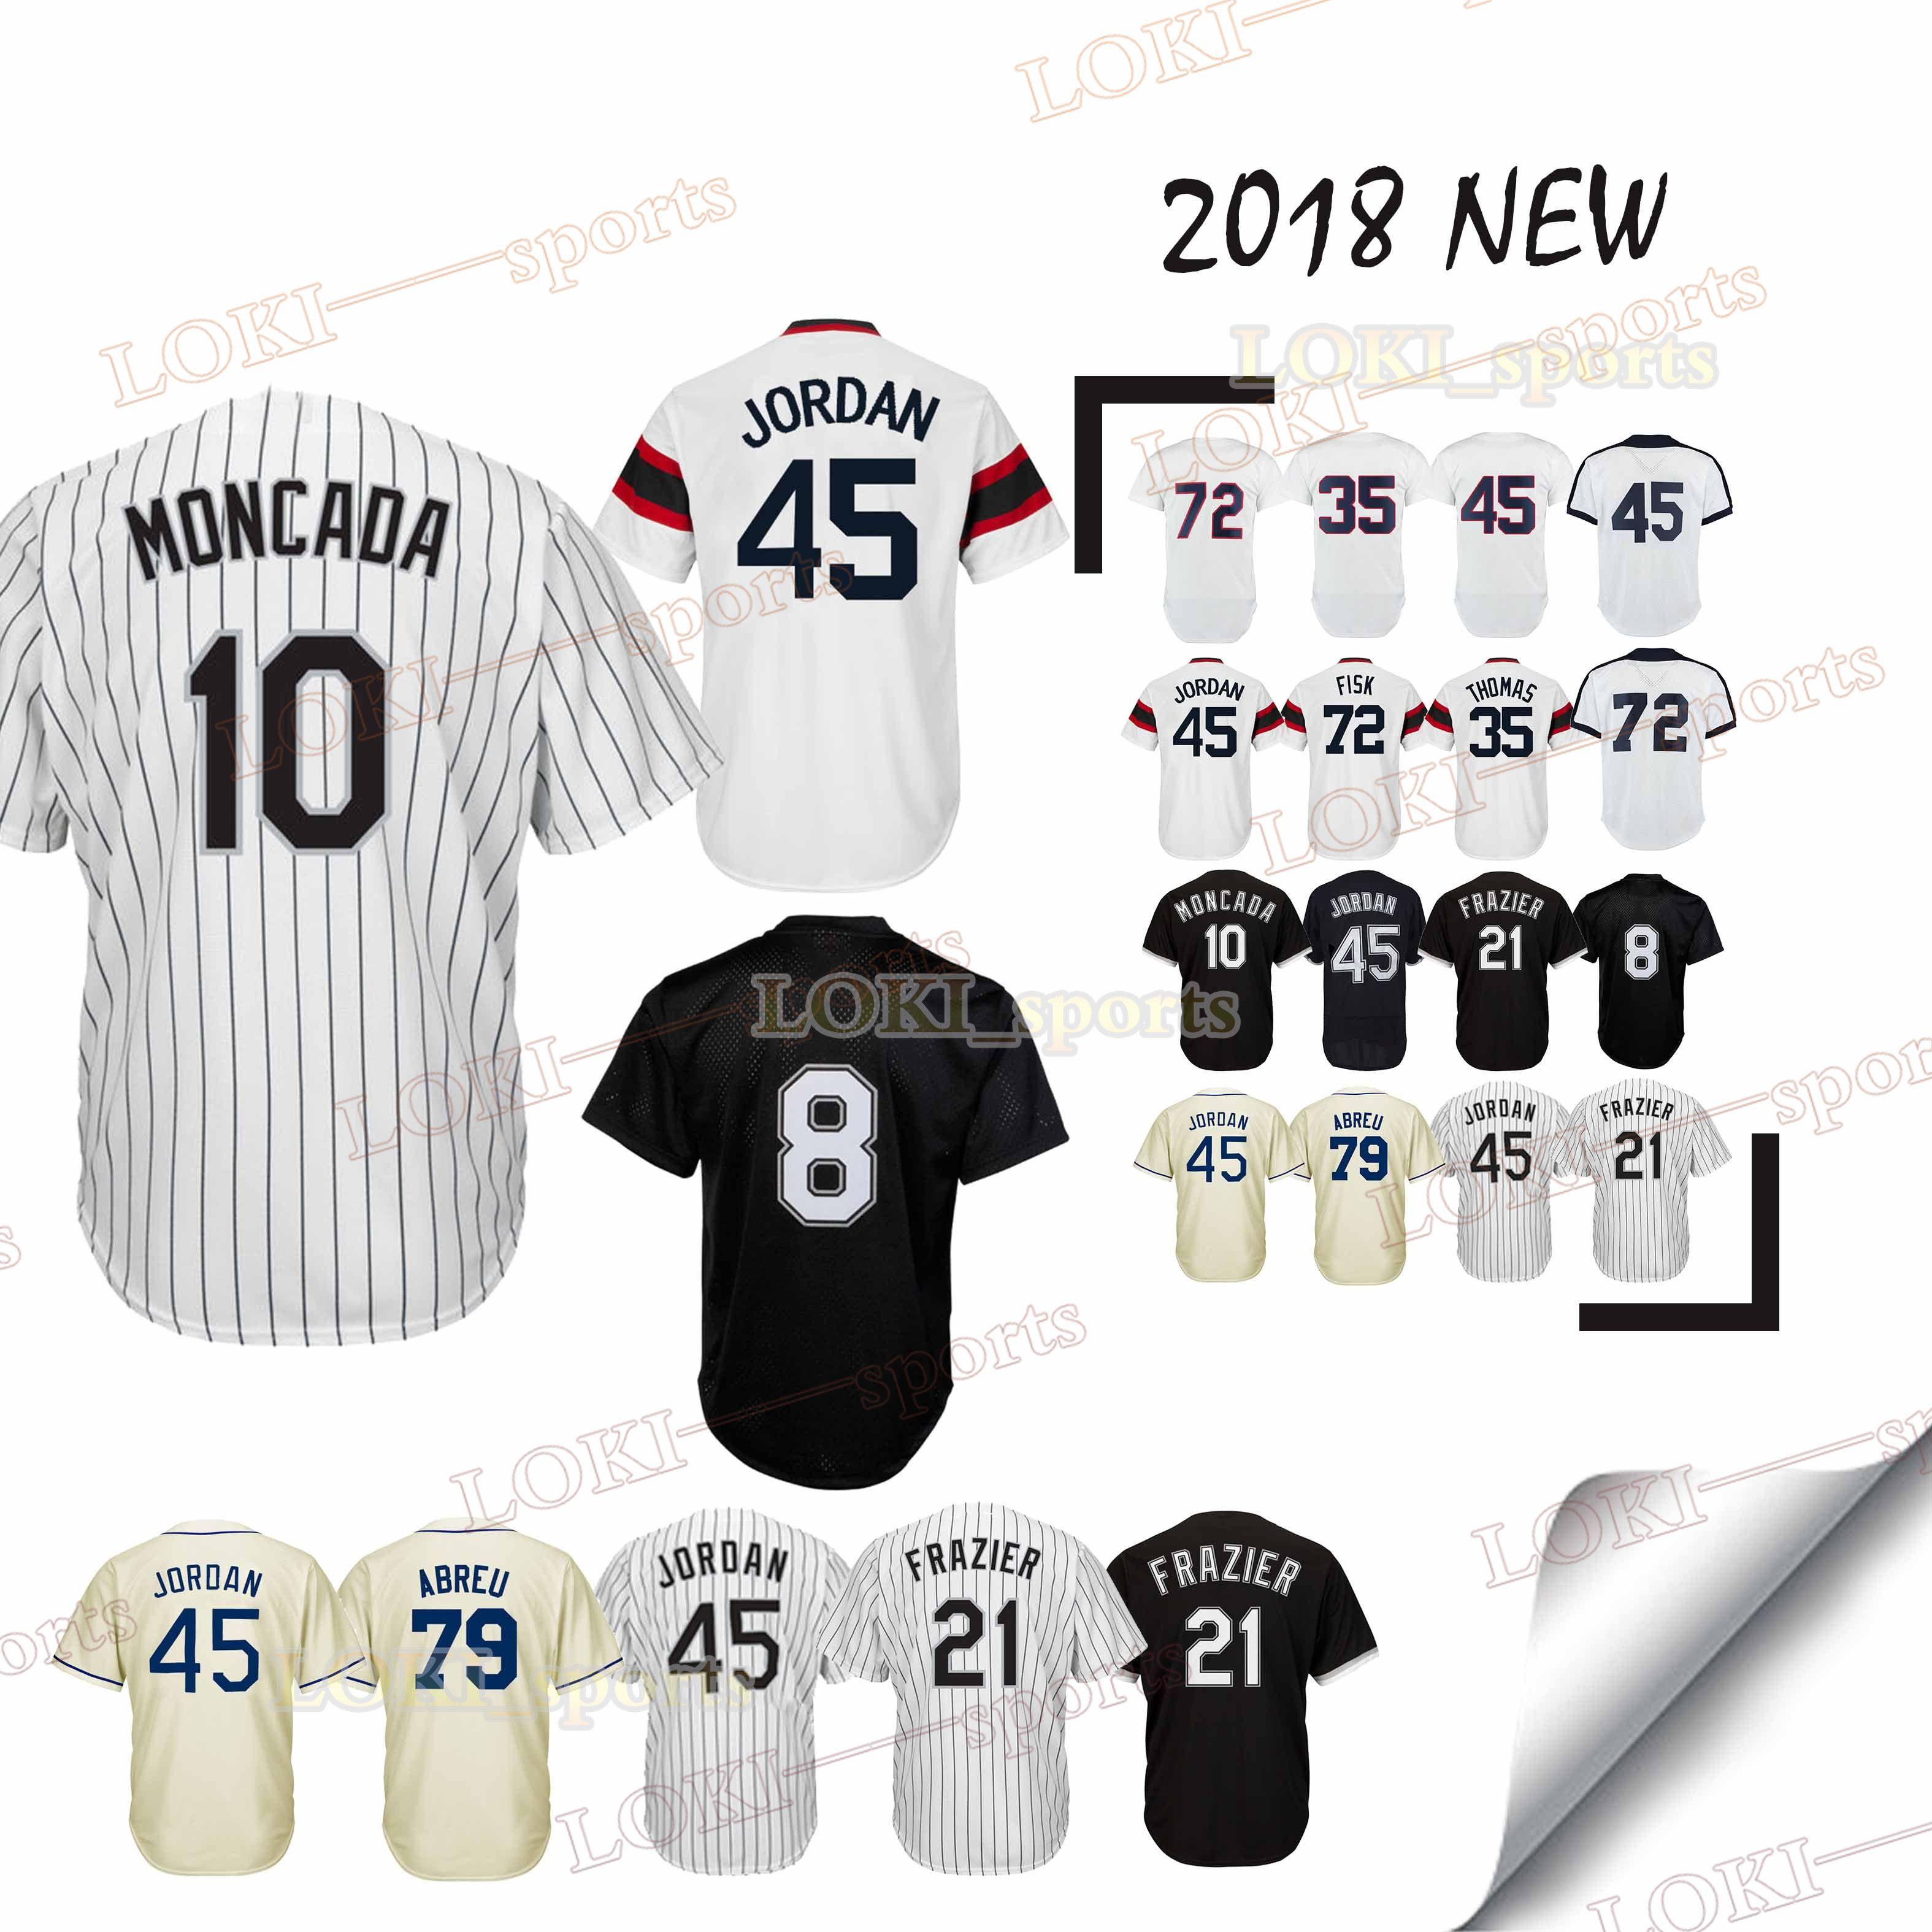 best website 18a4e 5742d Chicago White Sox jerseys 8 Bo Jackson 10 Yoan Moncada 79 Jose Abreu 35  Frank Thomas 18/19 new jersey men